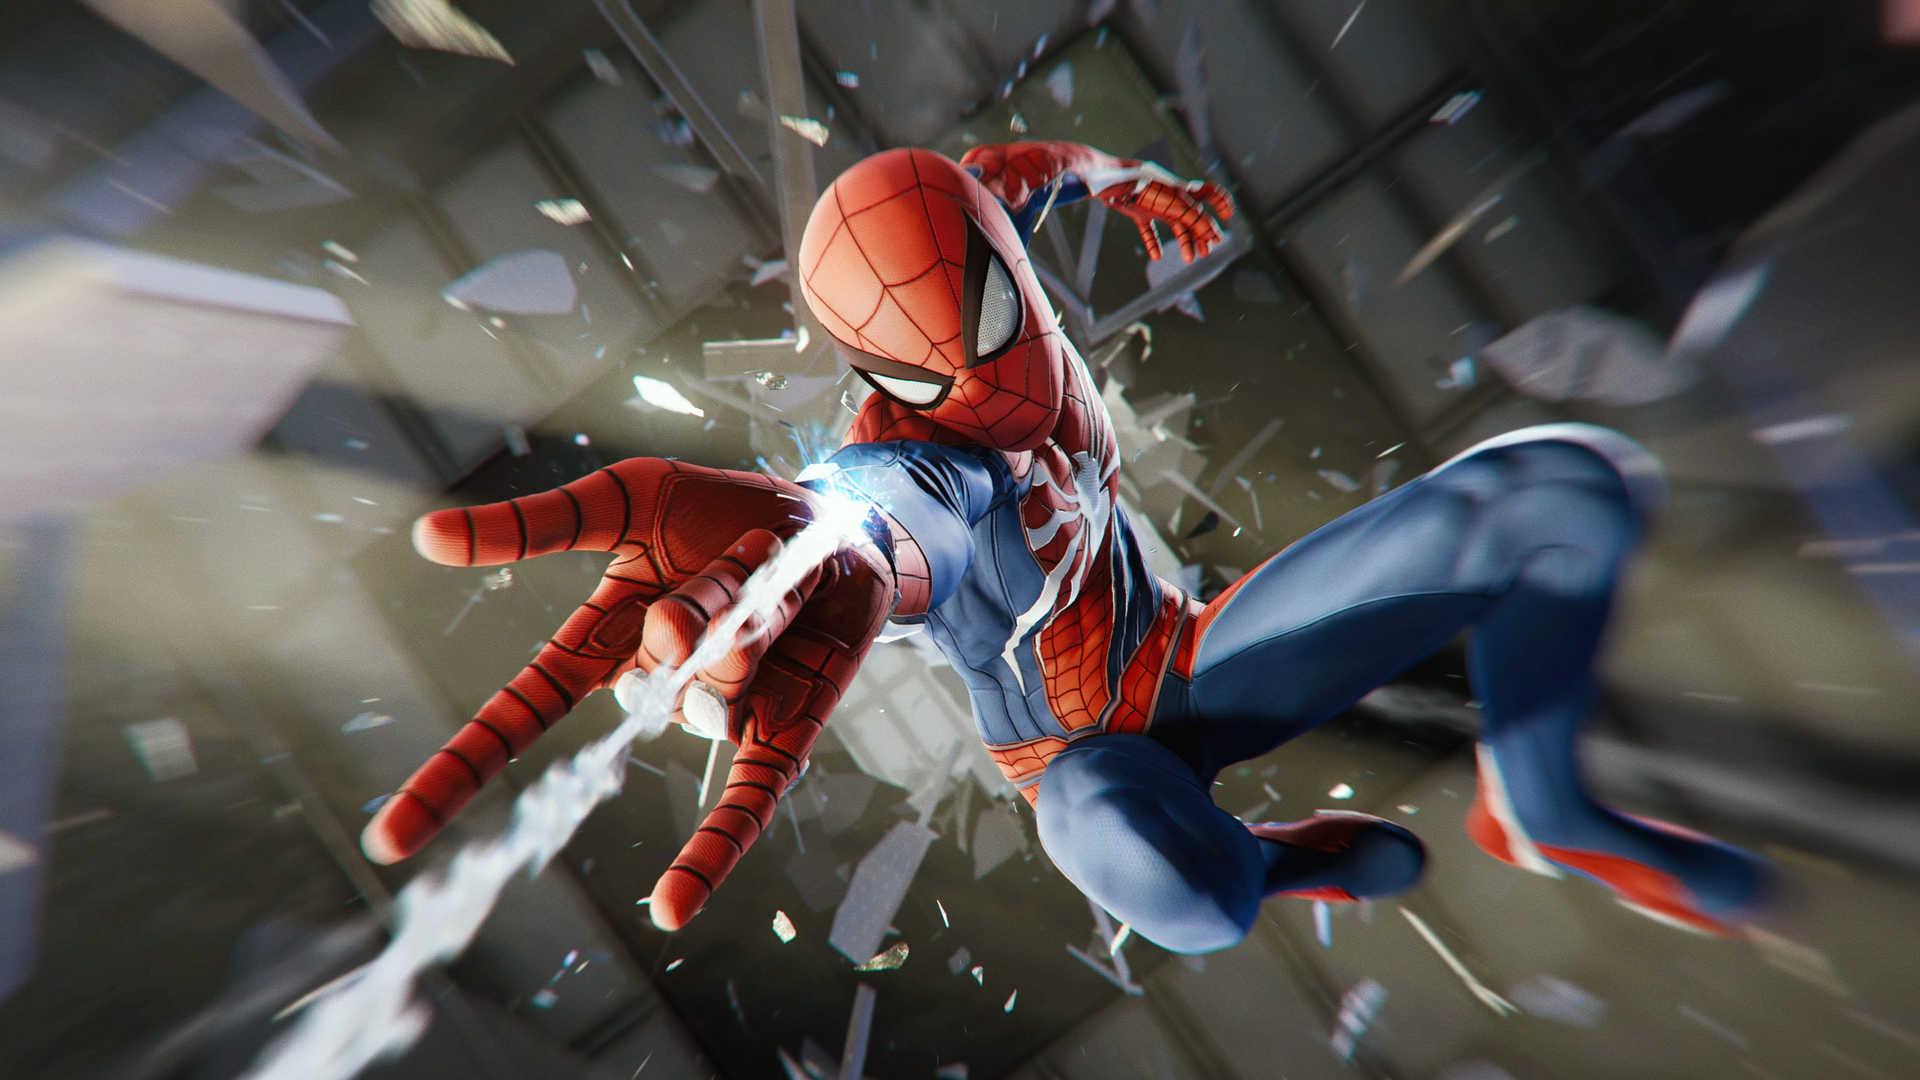 Слухи оскором выходе Marvel's Spider-Man 2